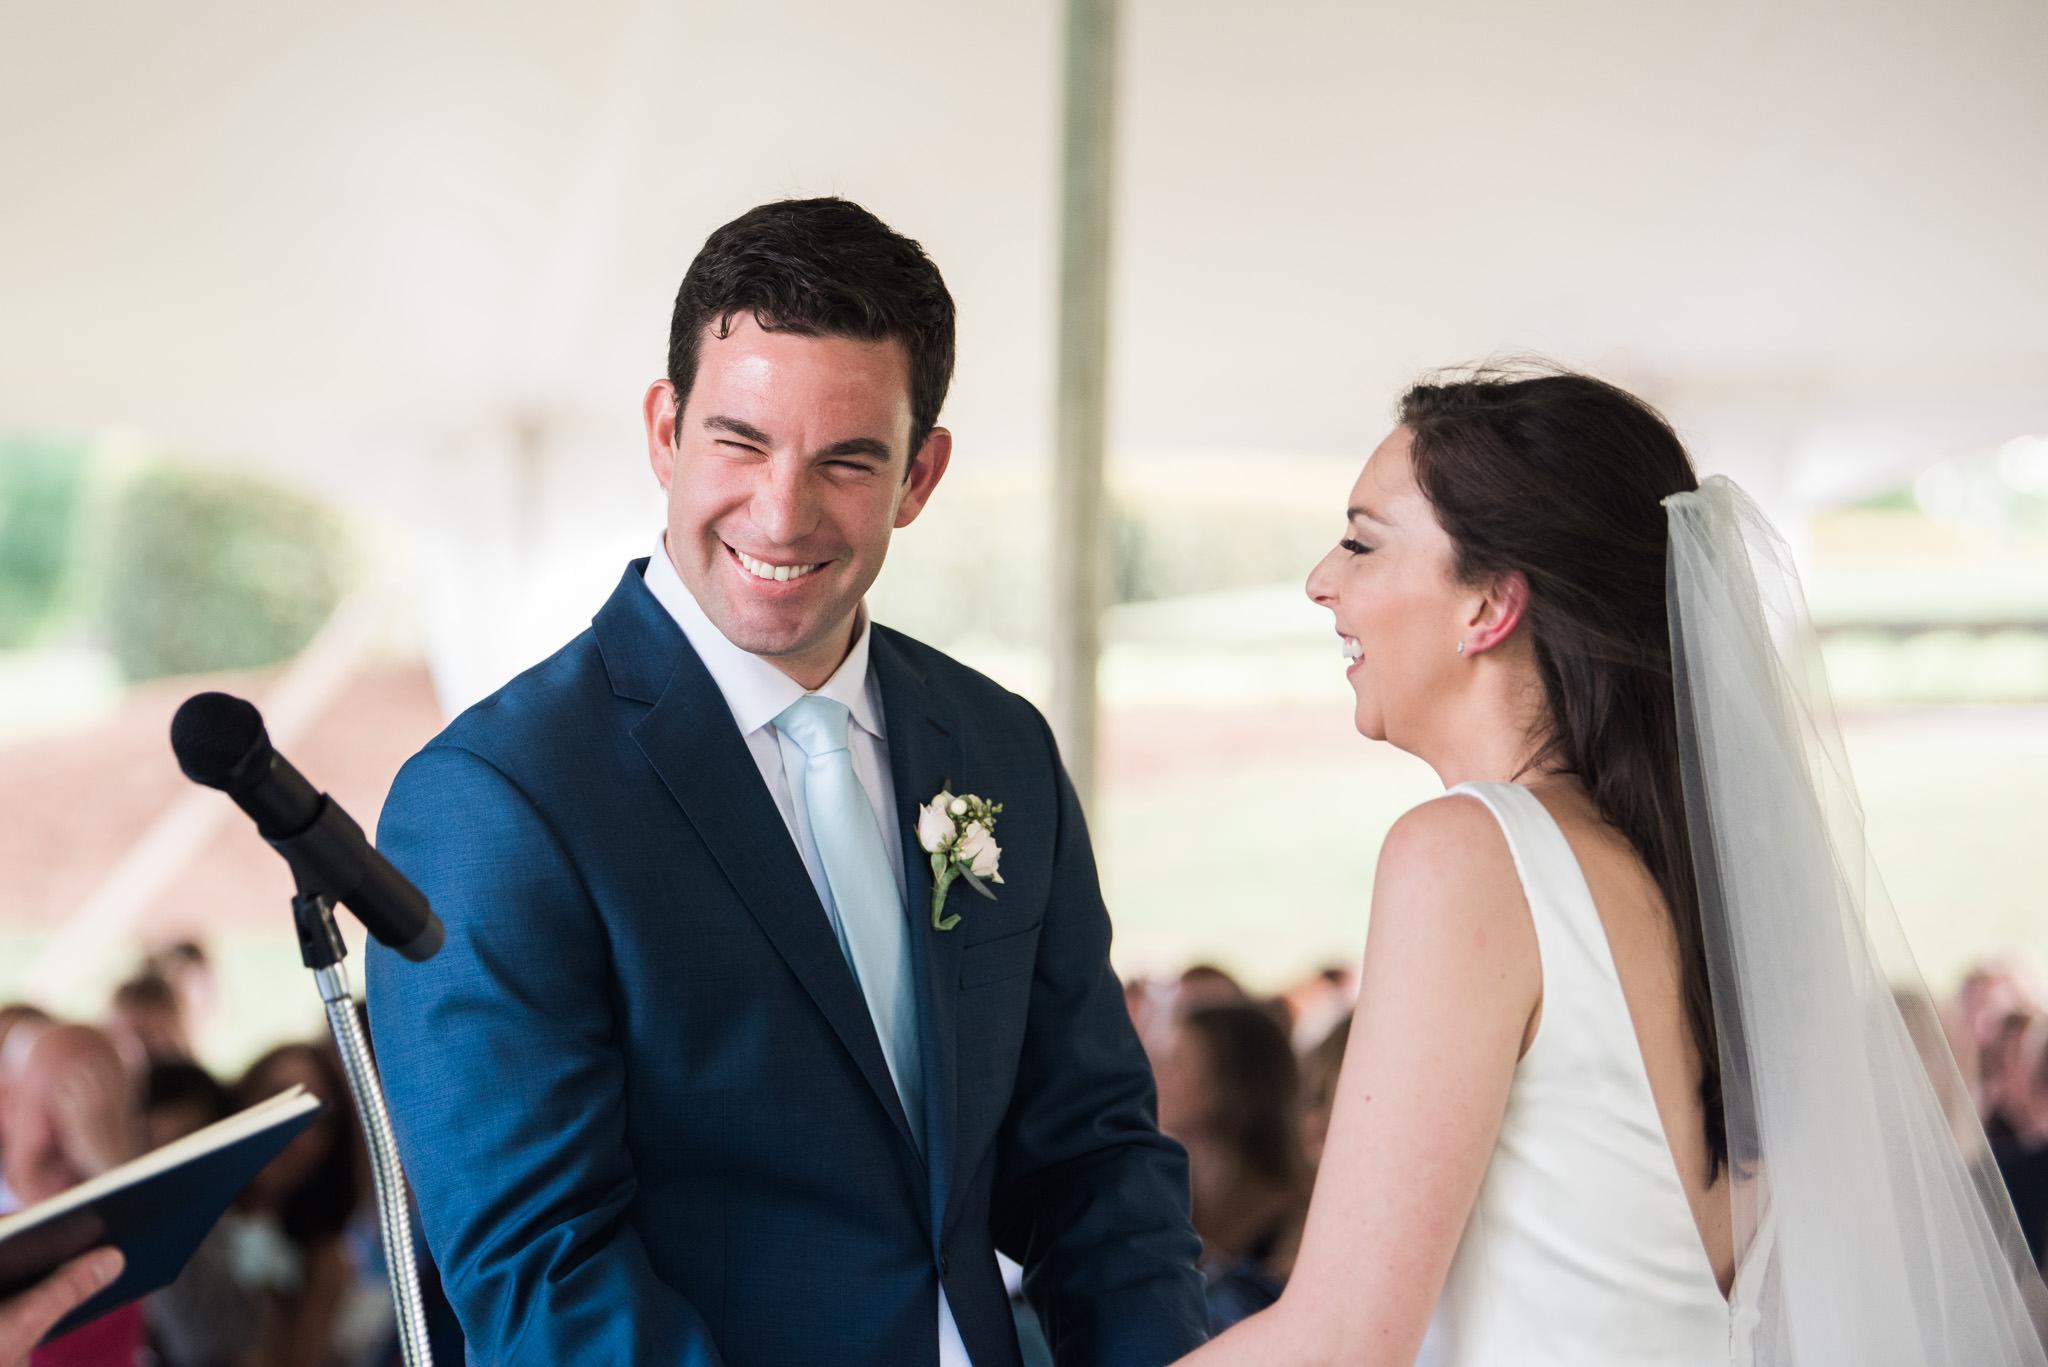 Athens-georiga-wedding-vows-70.jpg